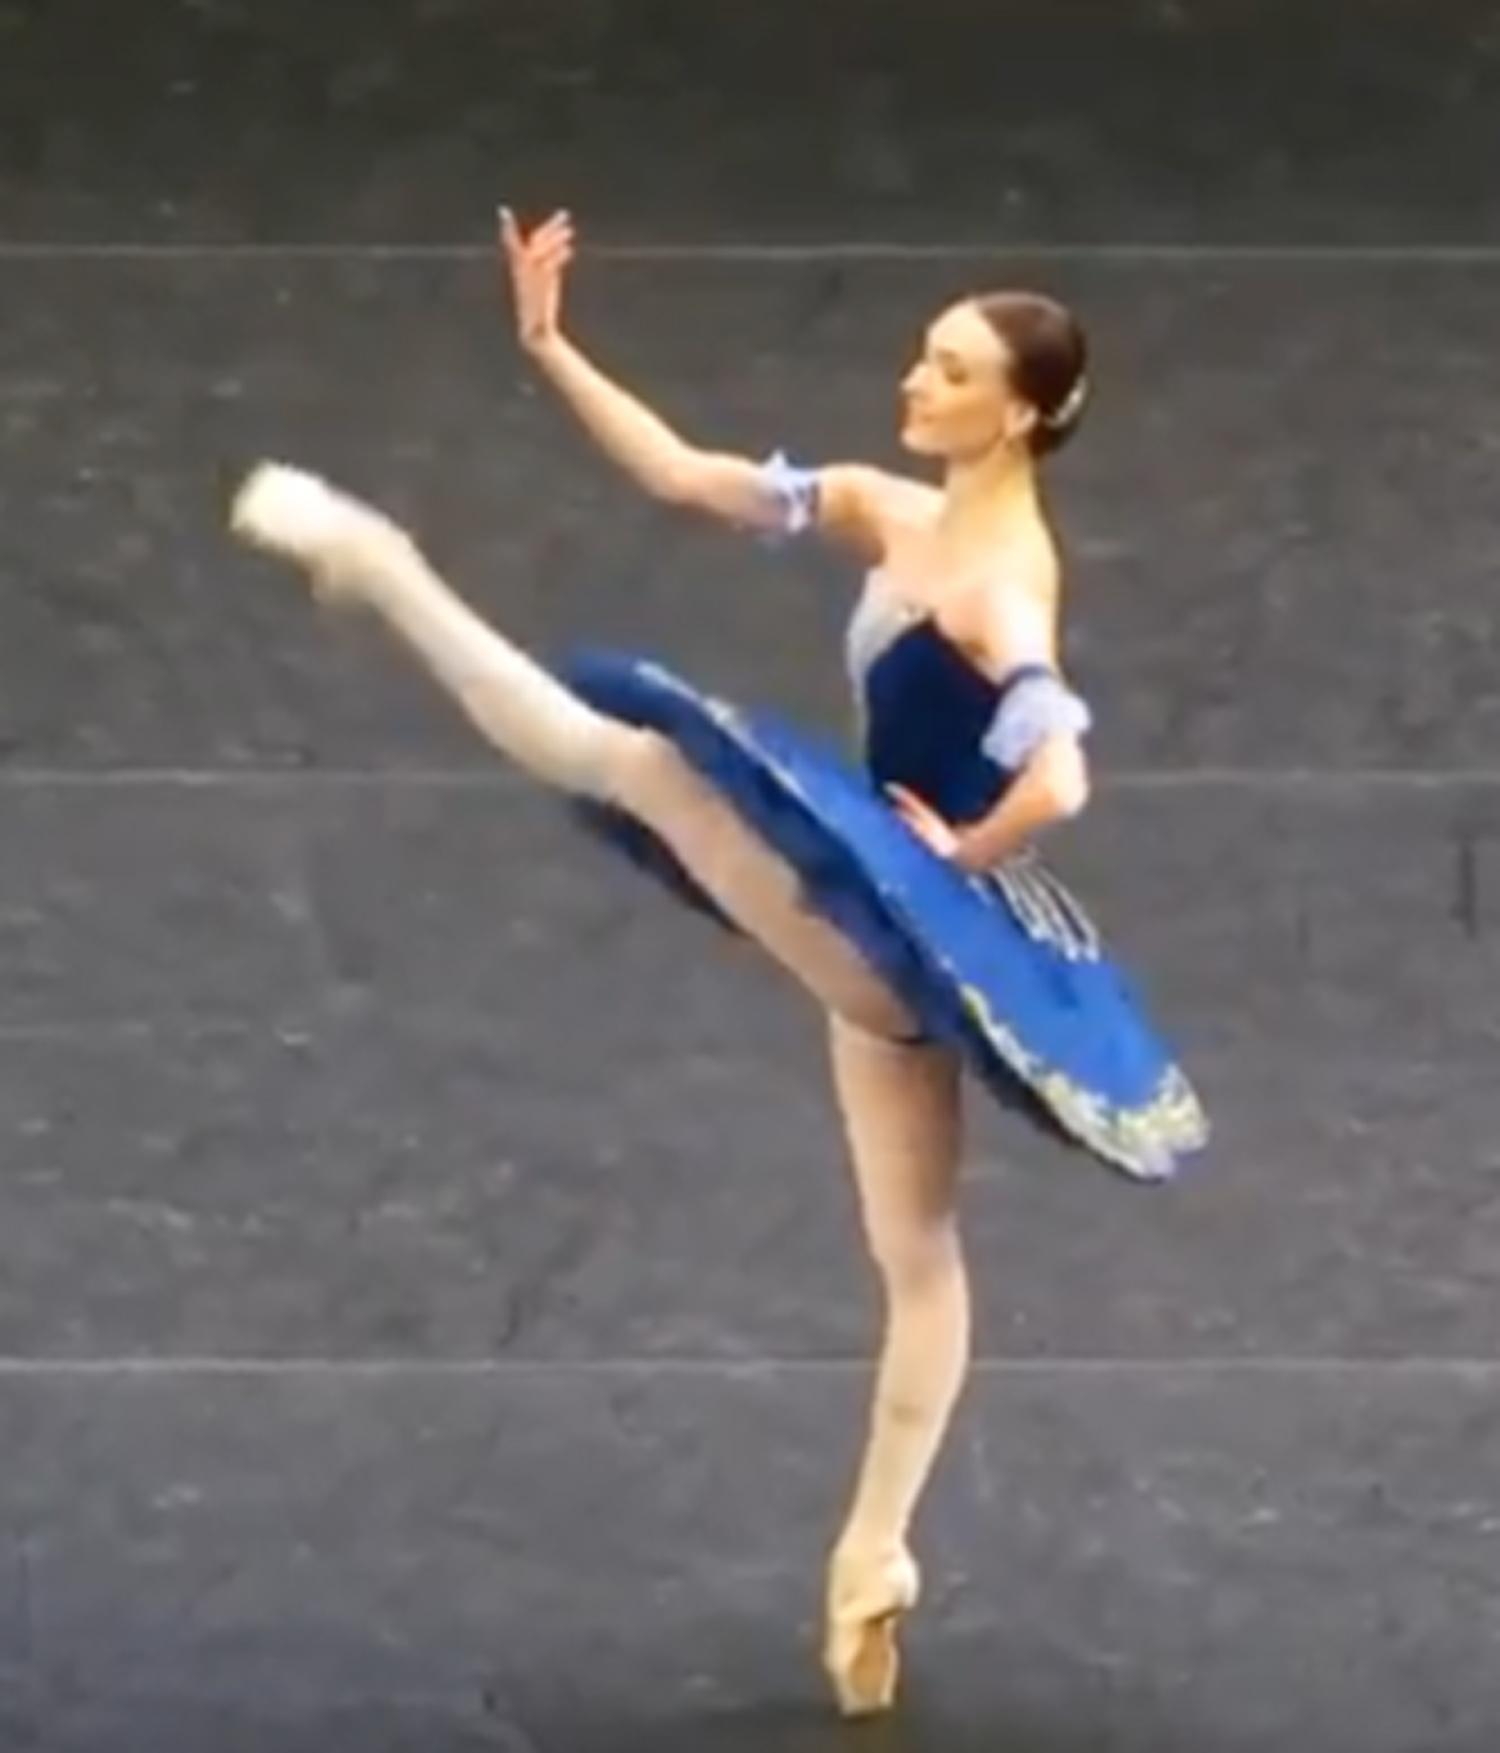 Hommage à Olga Smirnova